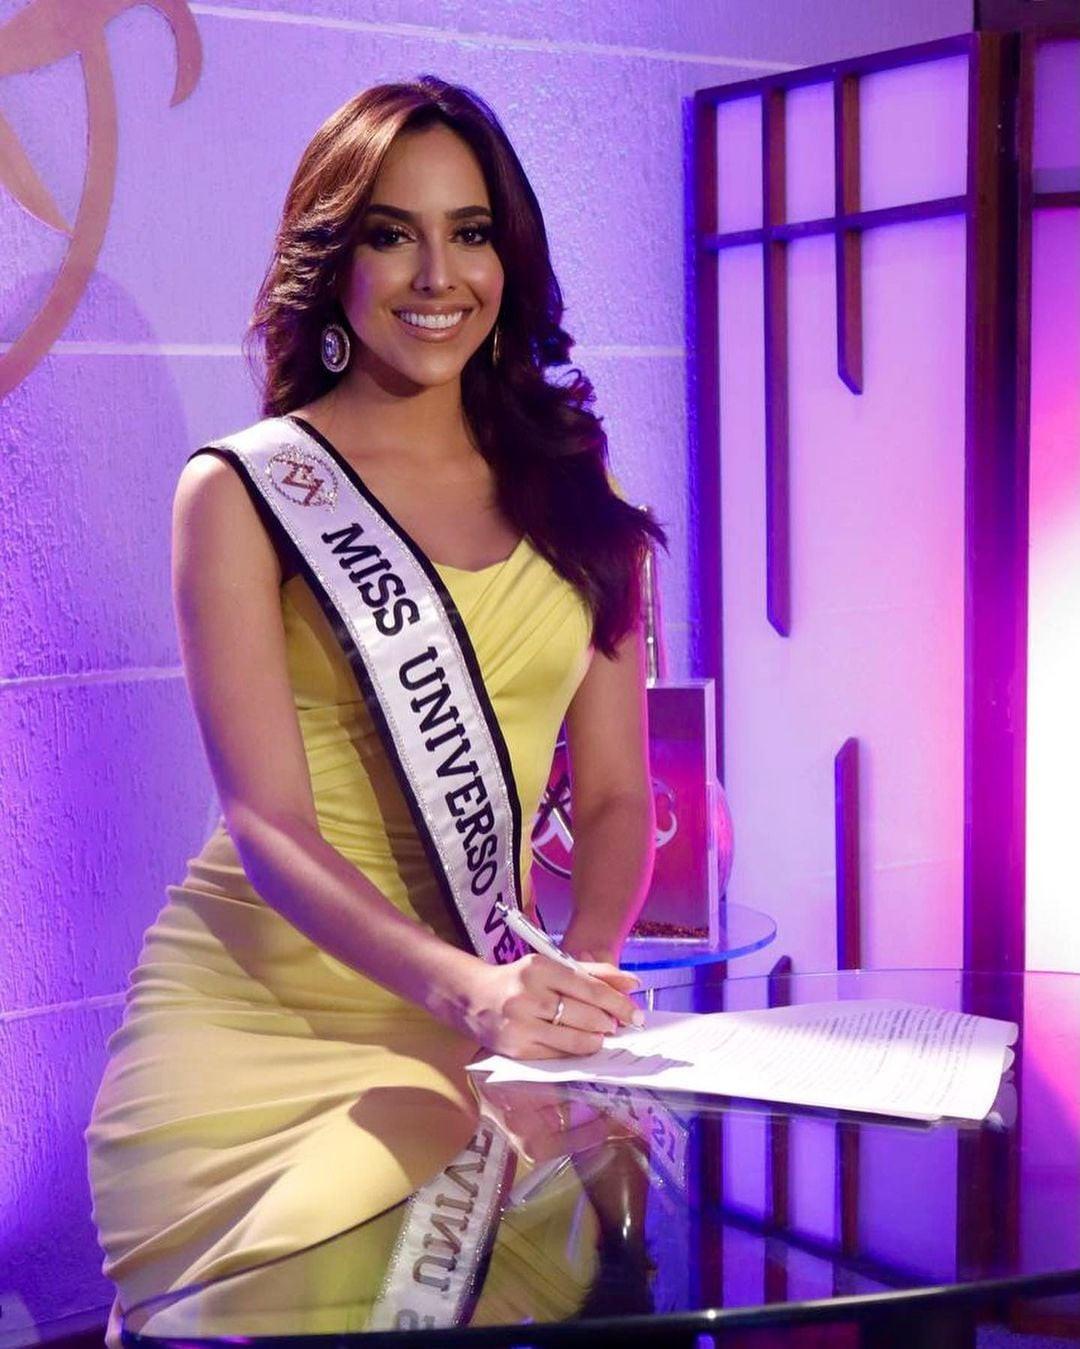 luiseth materan, miss universe venezuela 2021. Oozudp10